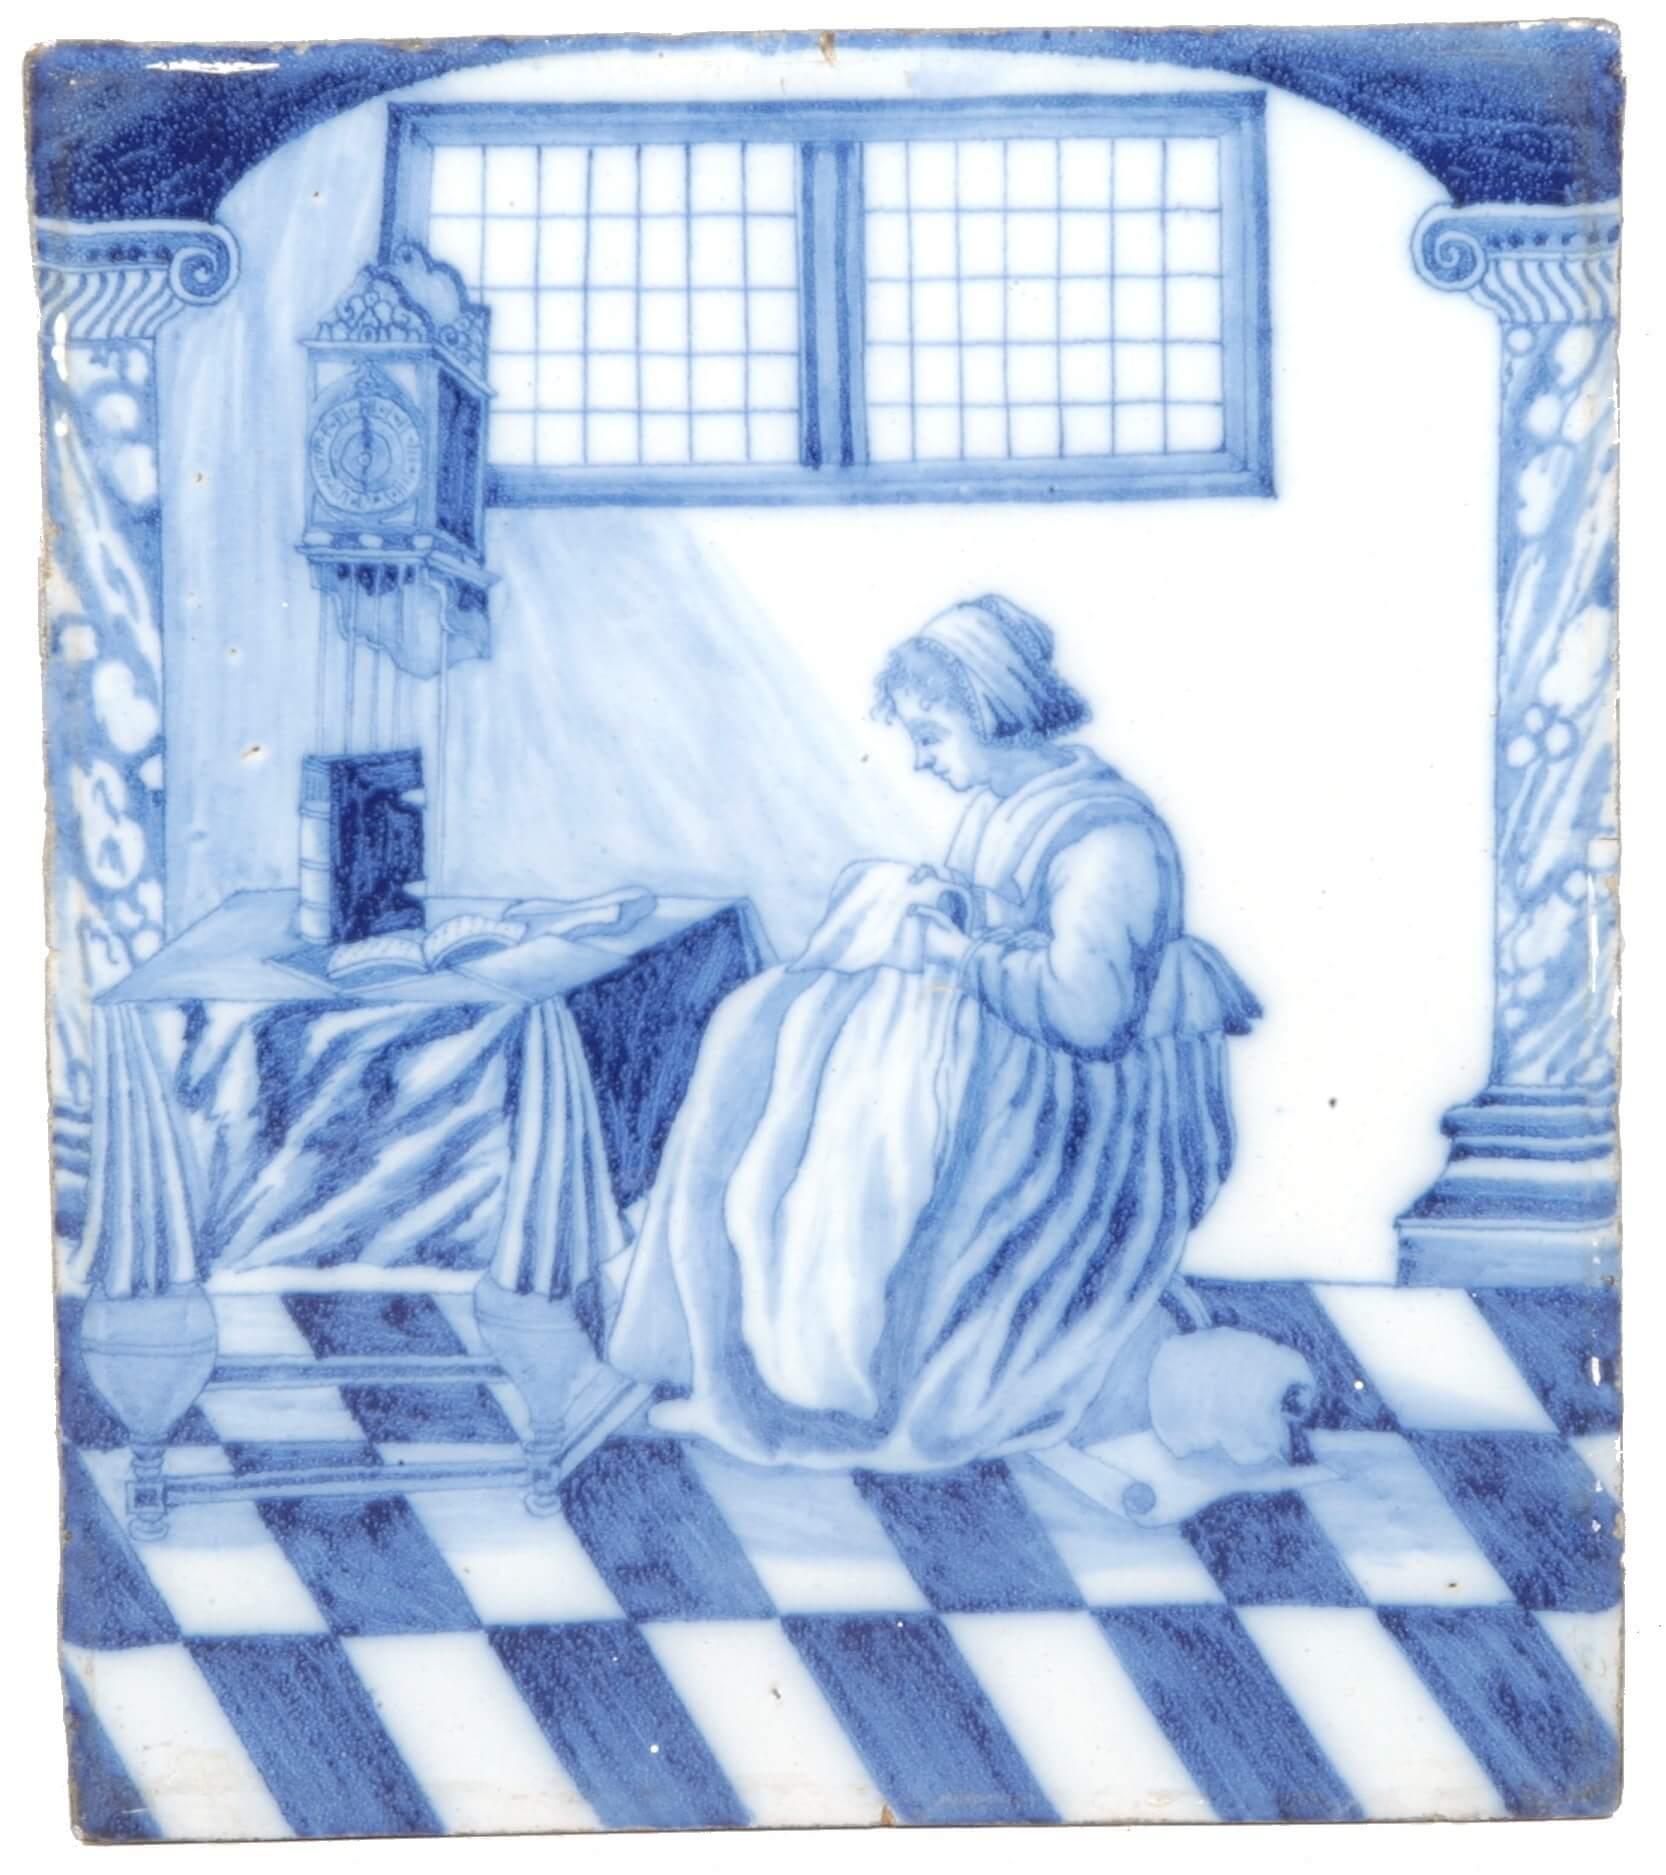 Antique Delft pottery blue and white plaque